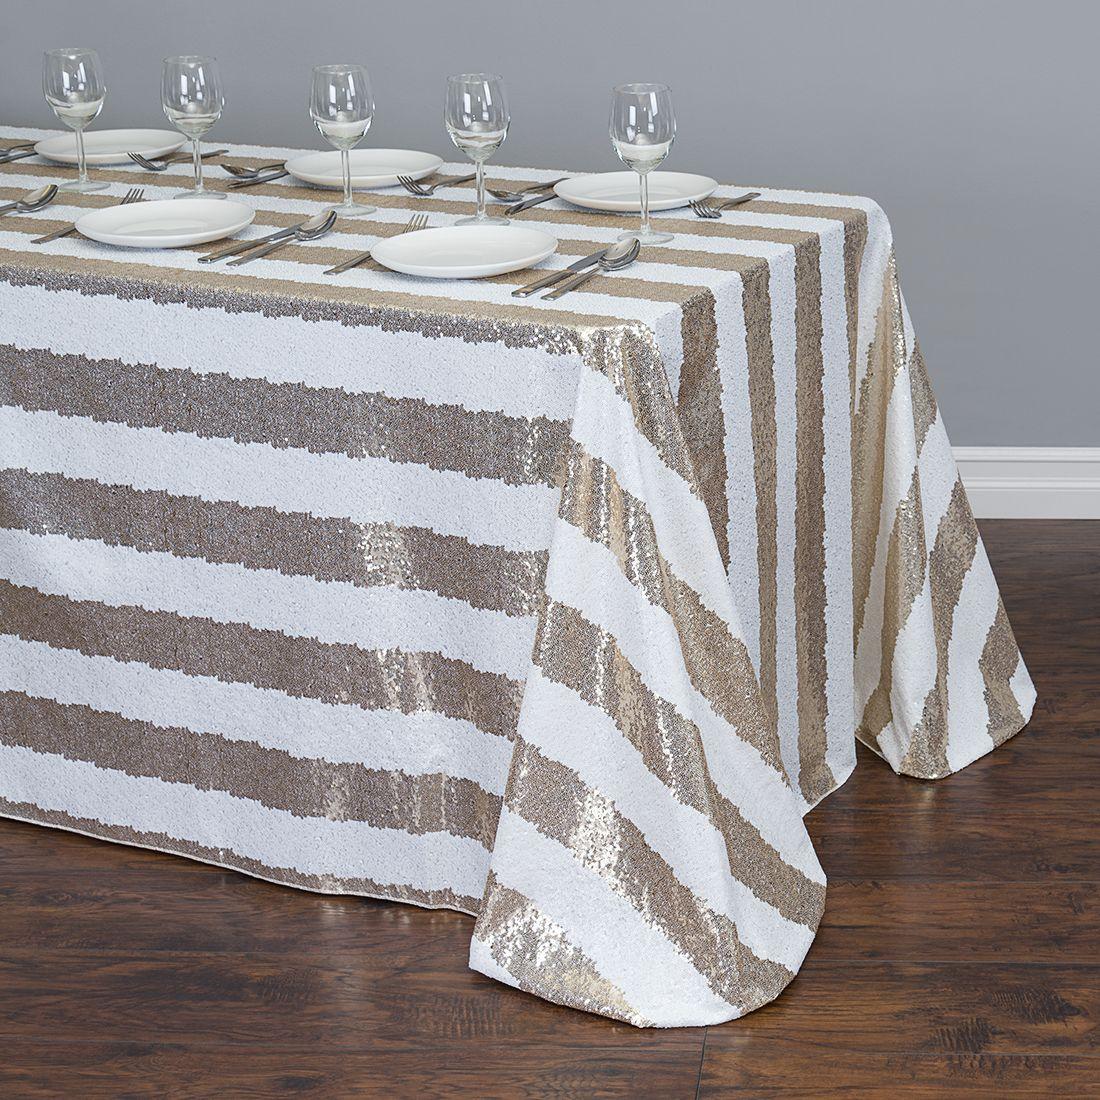 90 x 132 in rectangular sequin striped tablecloth gold white rh pinterest com